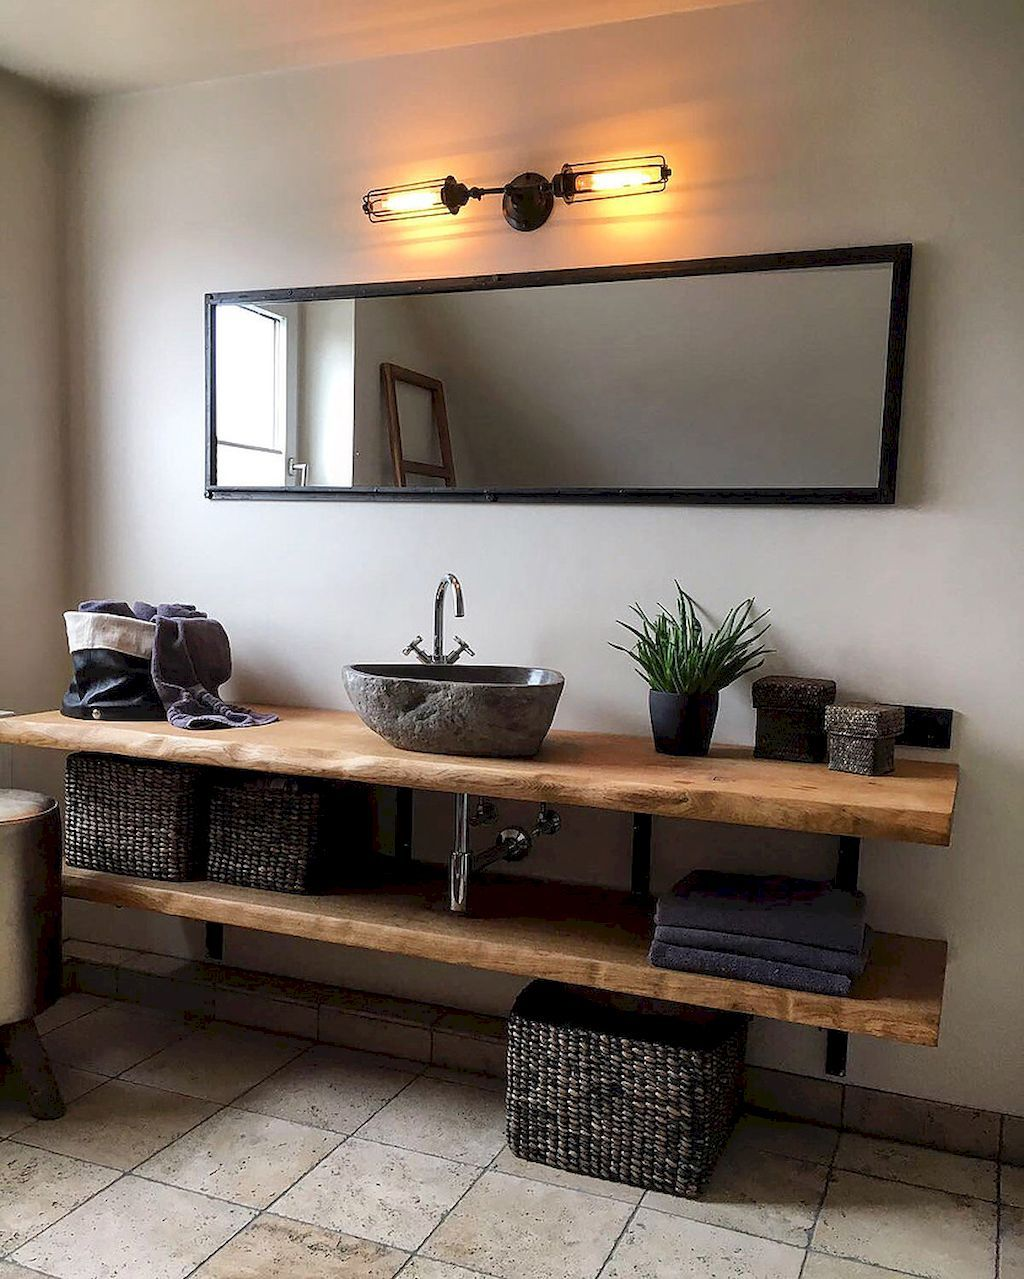 Guest 1 2 Bathroom Ideas: Gorgeous Guest Bathroom Remodel Ideas (84)